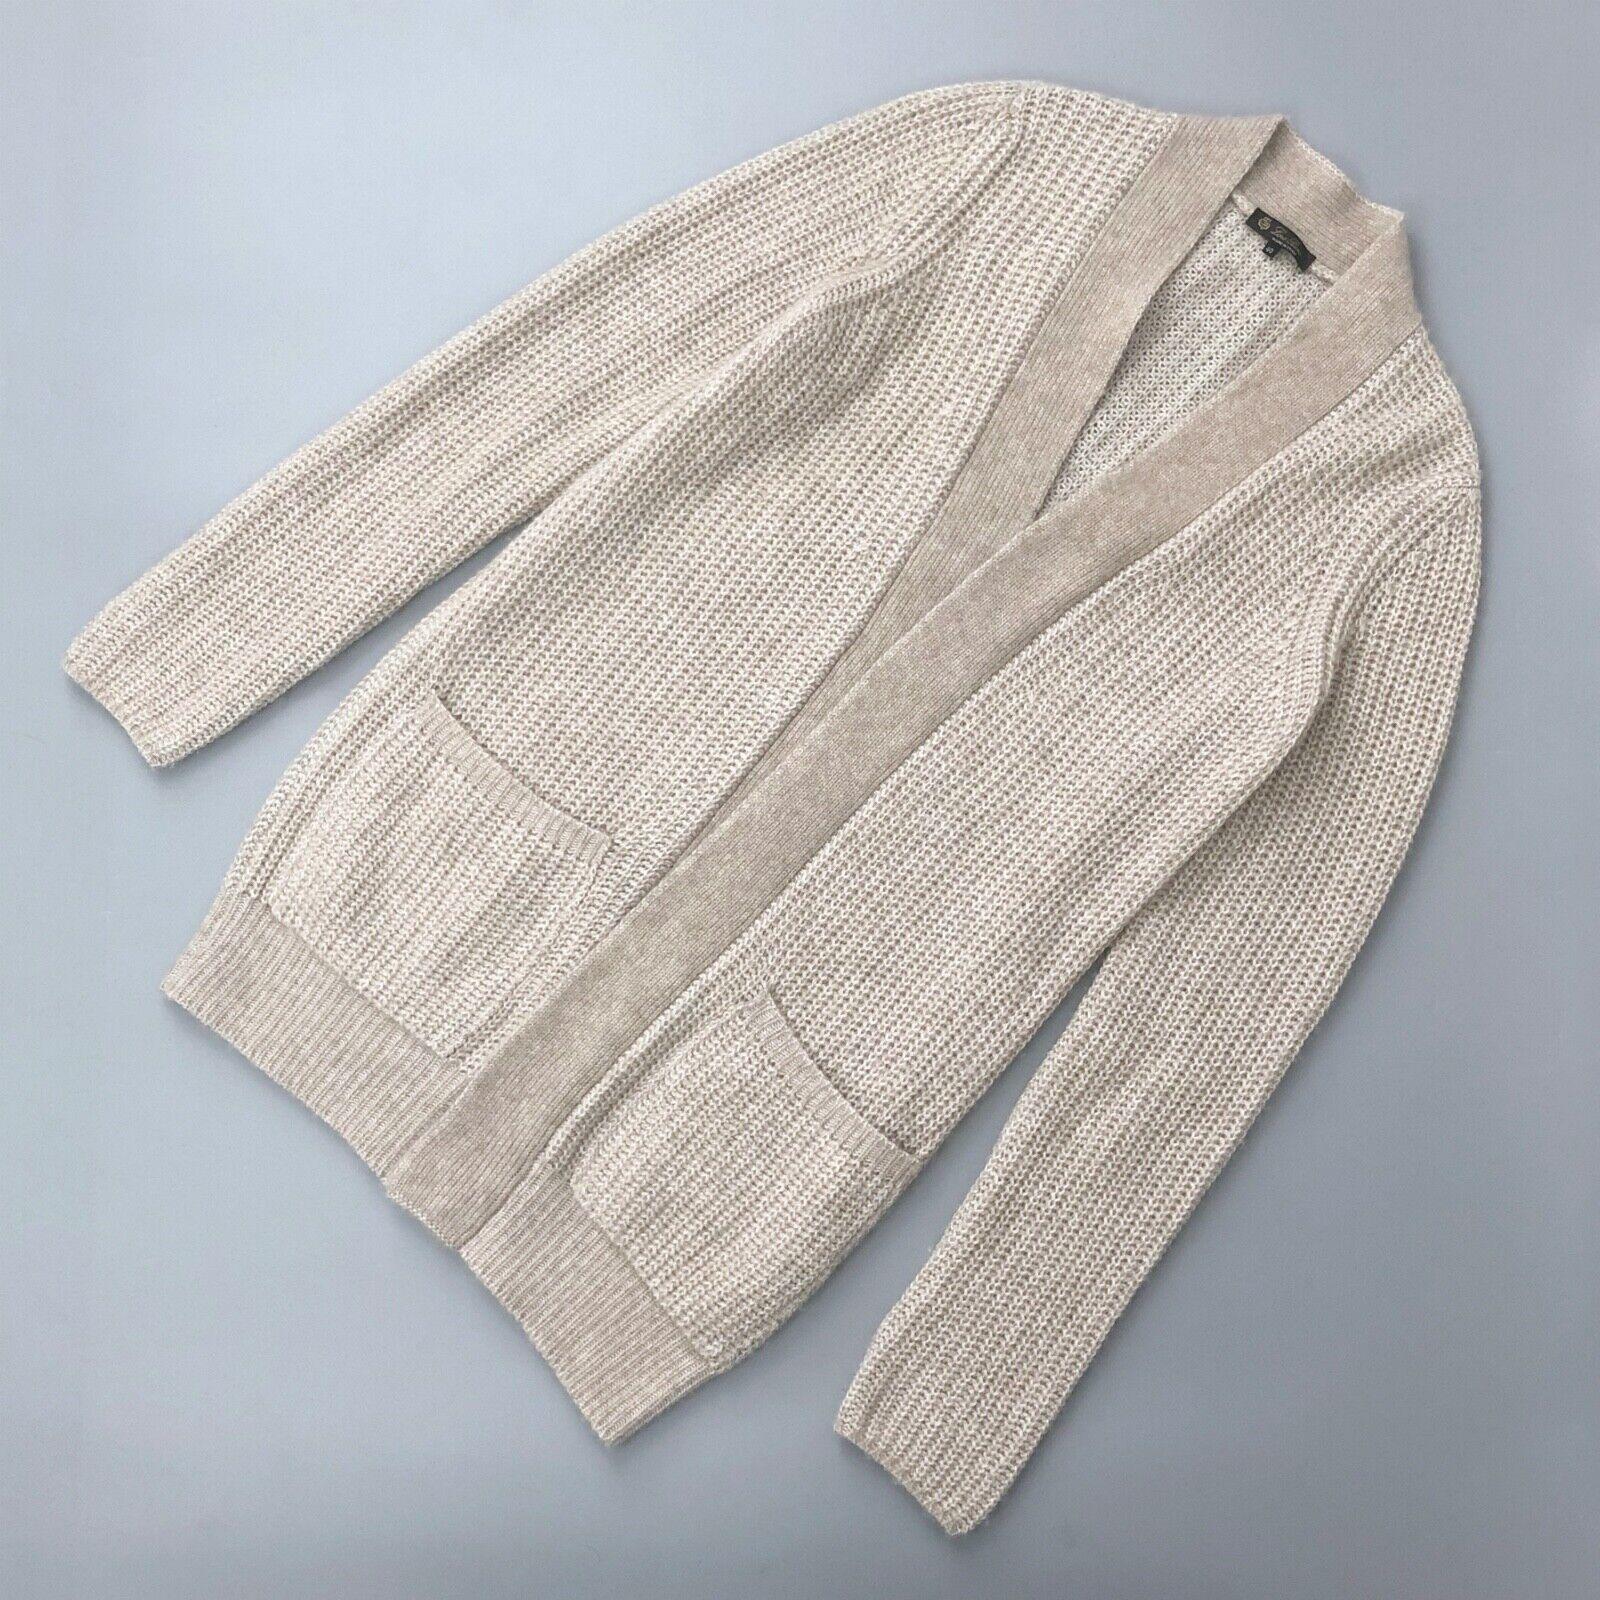 LGold Piana damen Cream CASHMERE Silk Knit OverGrößed Long Cardigan Sweater Größe S